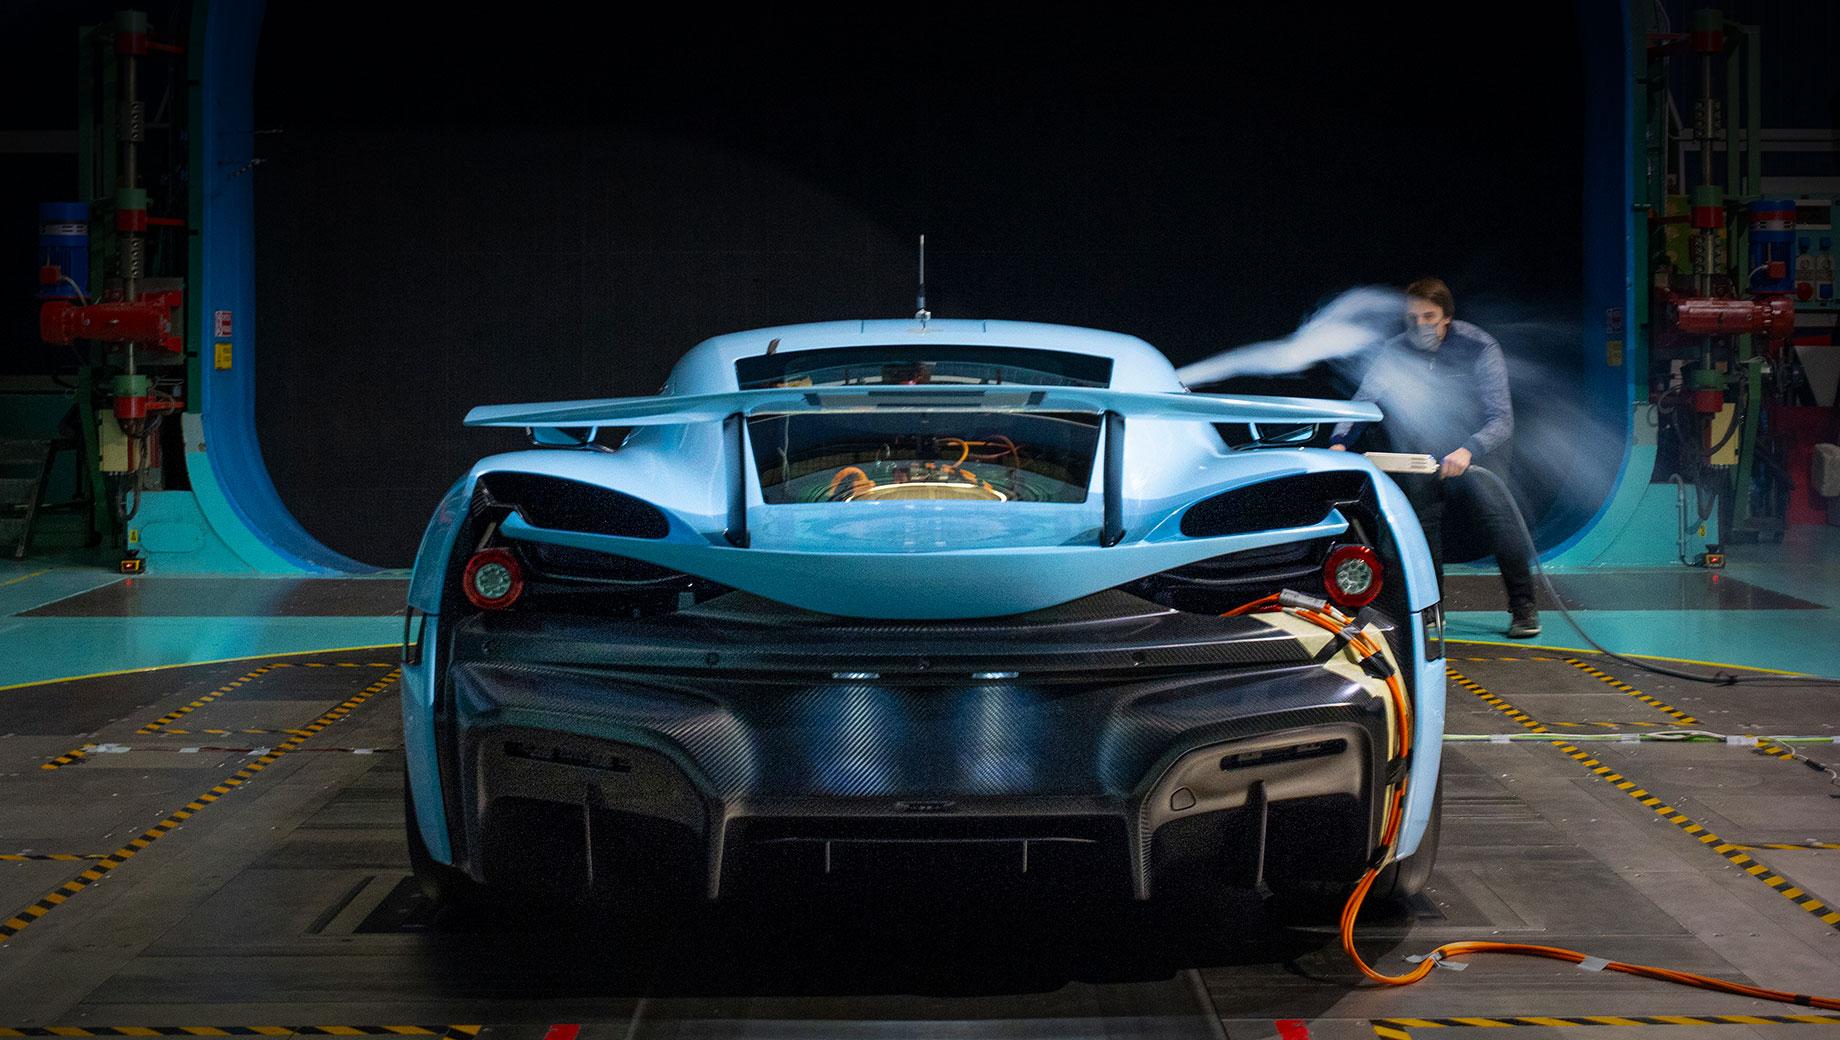 Дополнено: У купе Rimac C_Two улучшилась аэродинамика